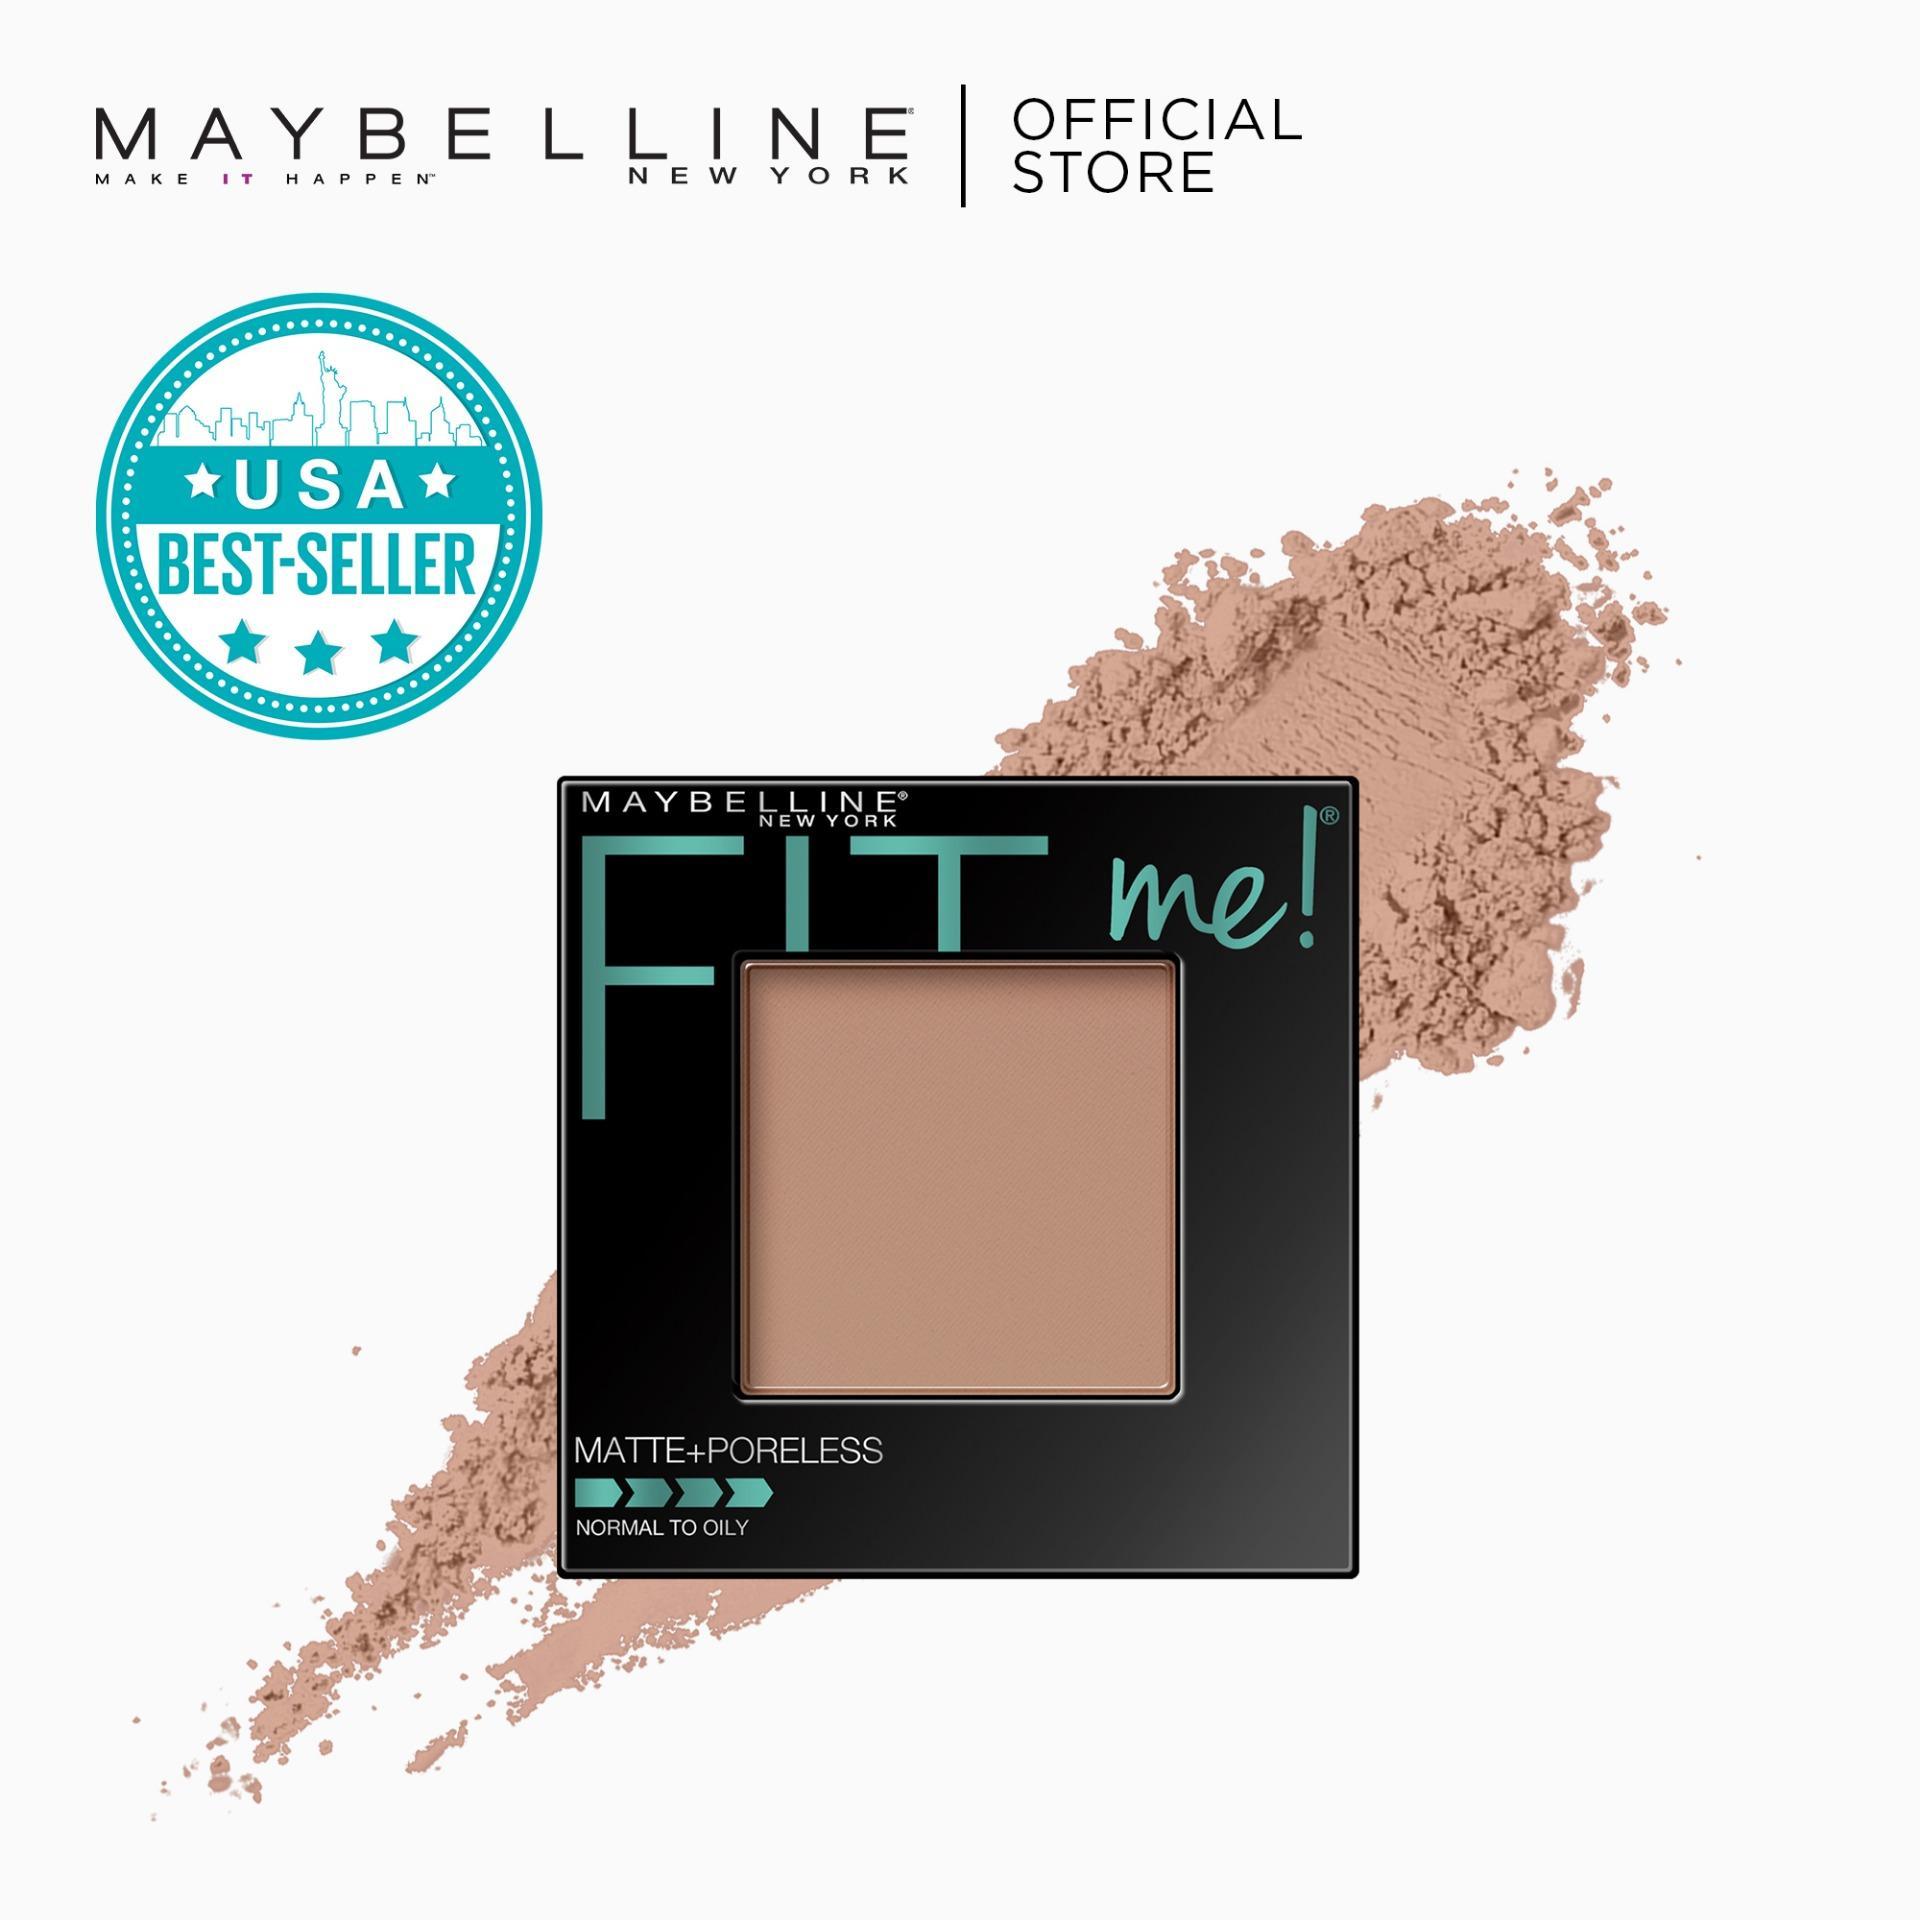 Maybelline Fit Me Matte + Poreless Pressed Powder - 235 Pure Beige Philippines